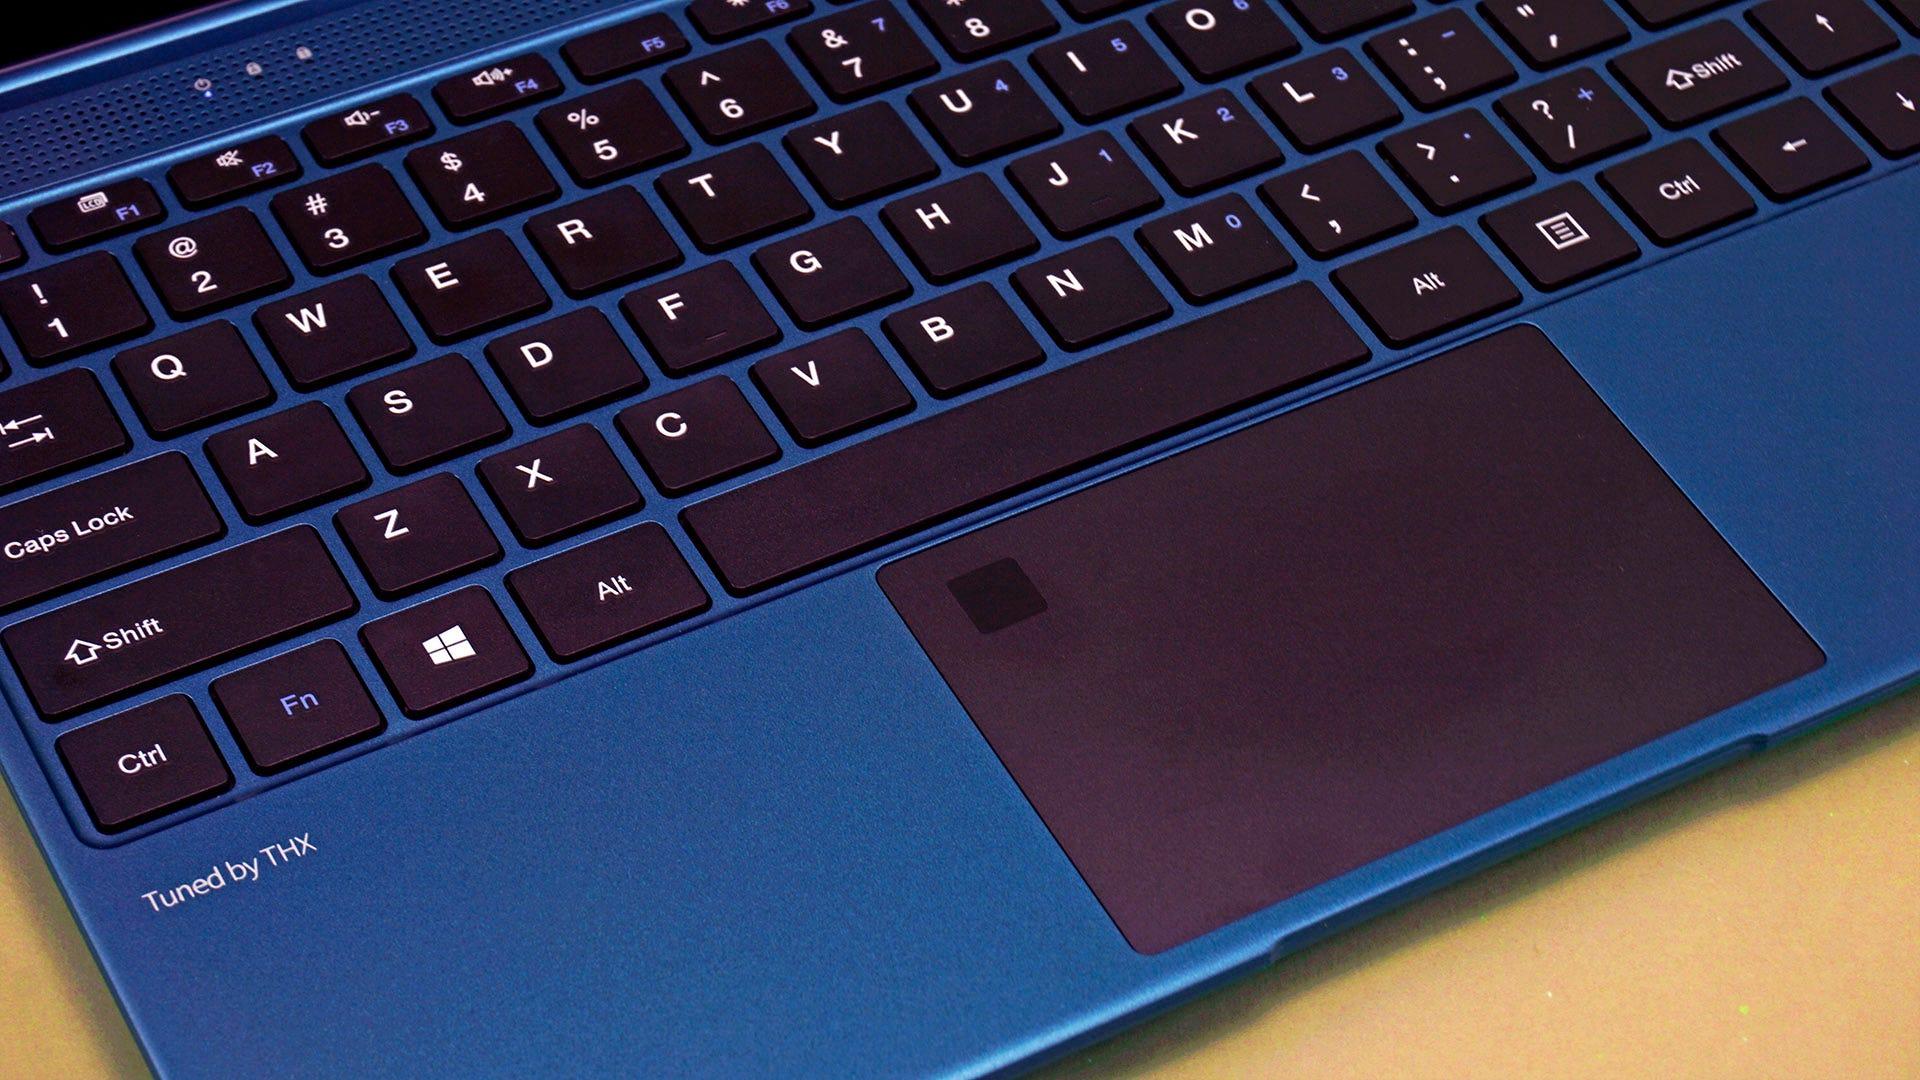 Gateway laptop fingerprint sensor